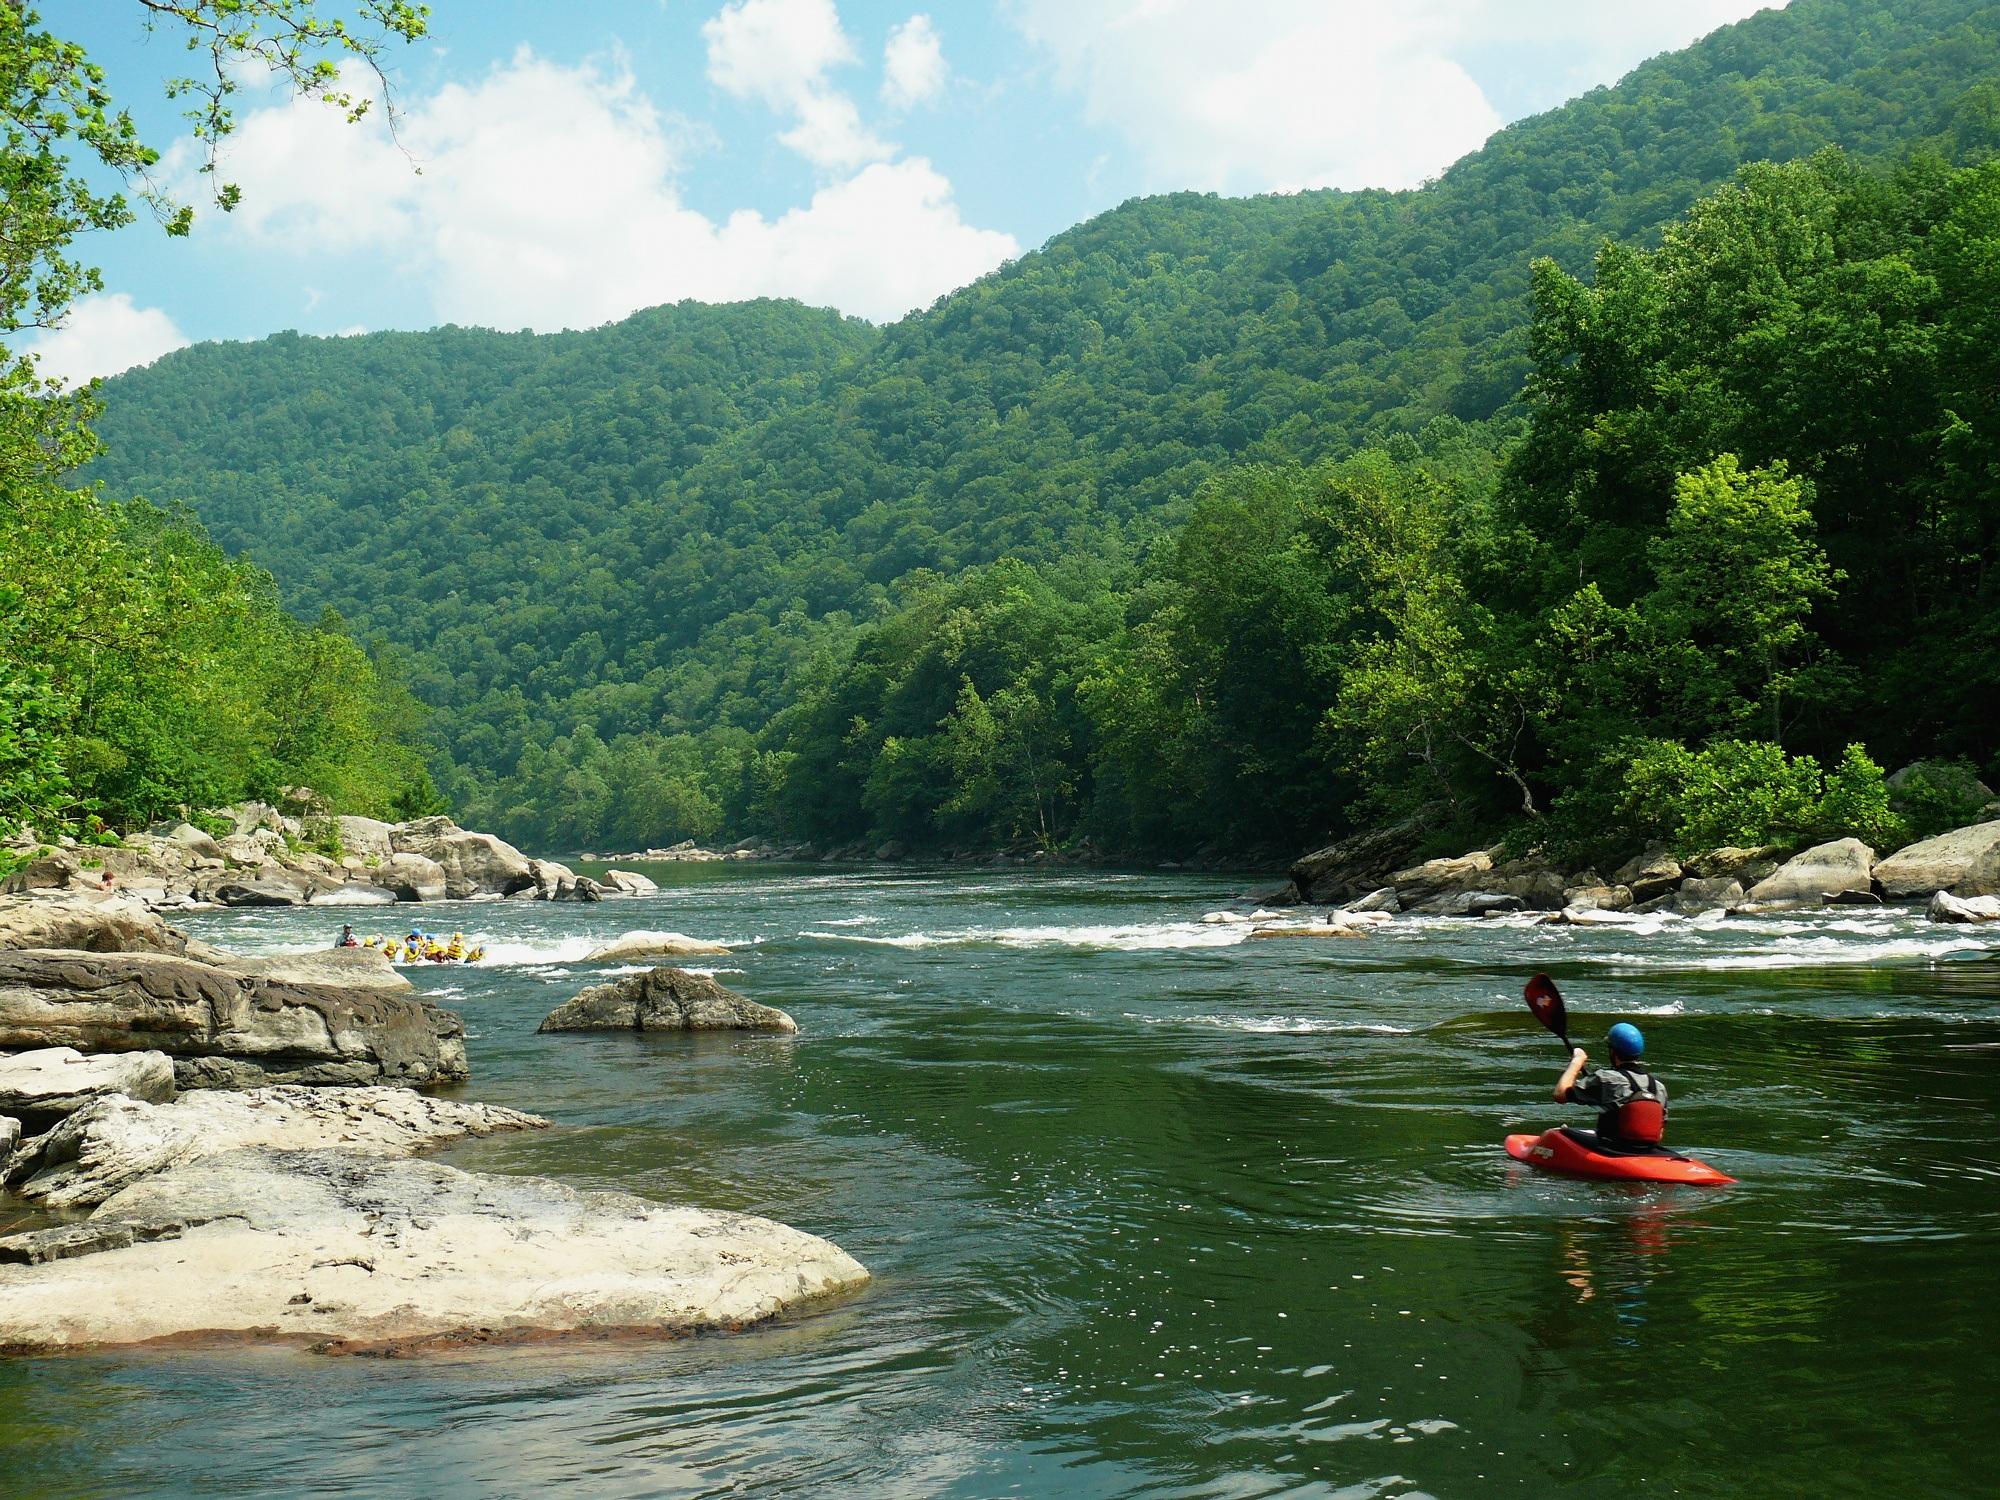 Kayaking sport on the river free image